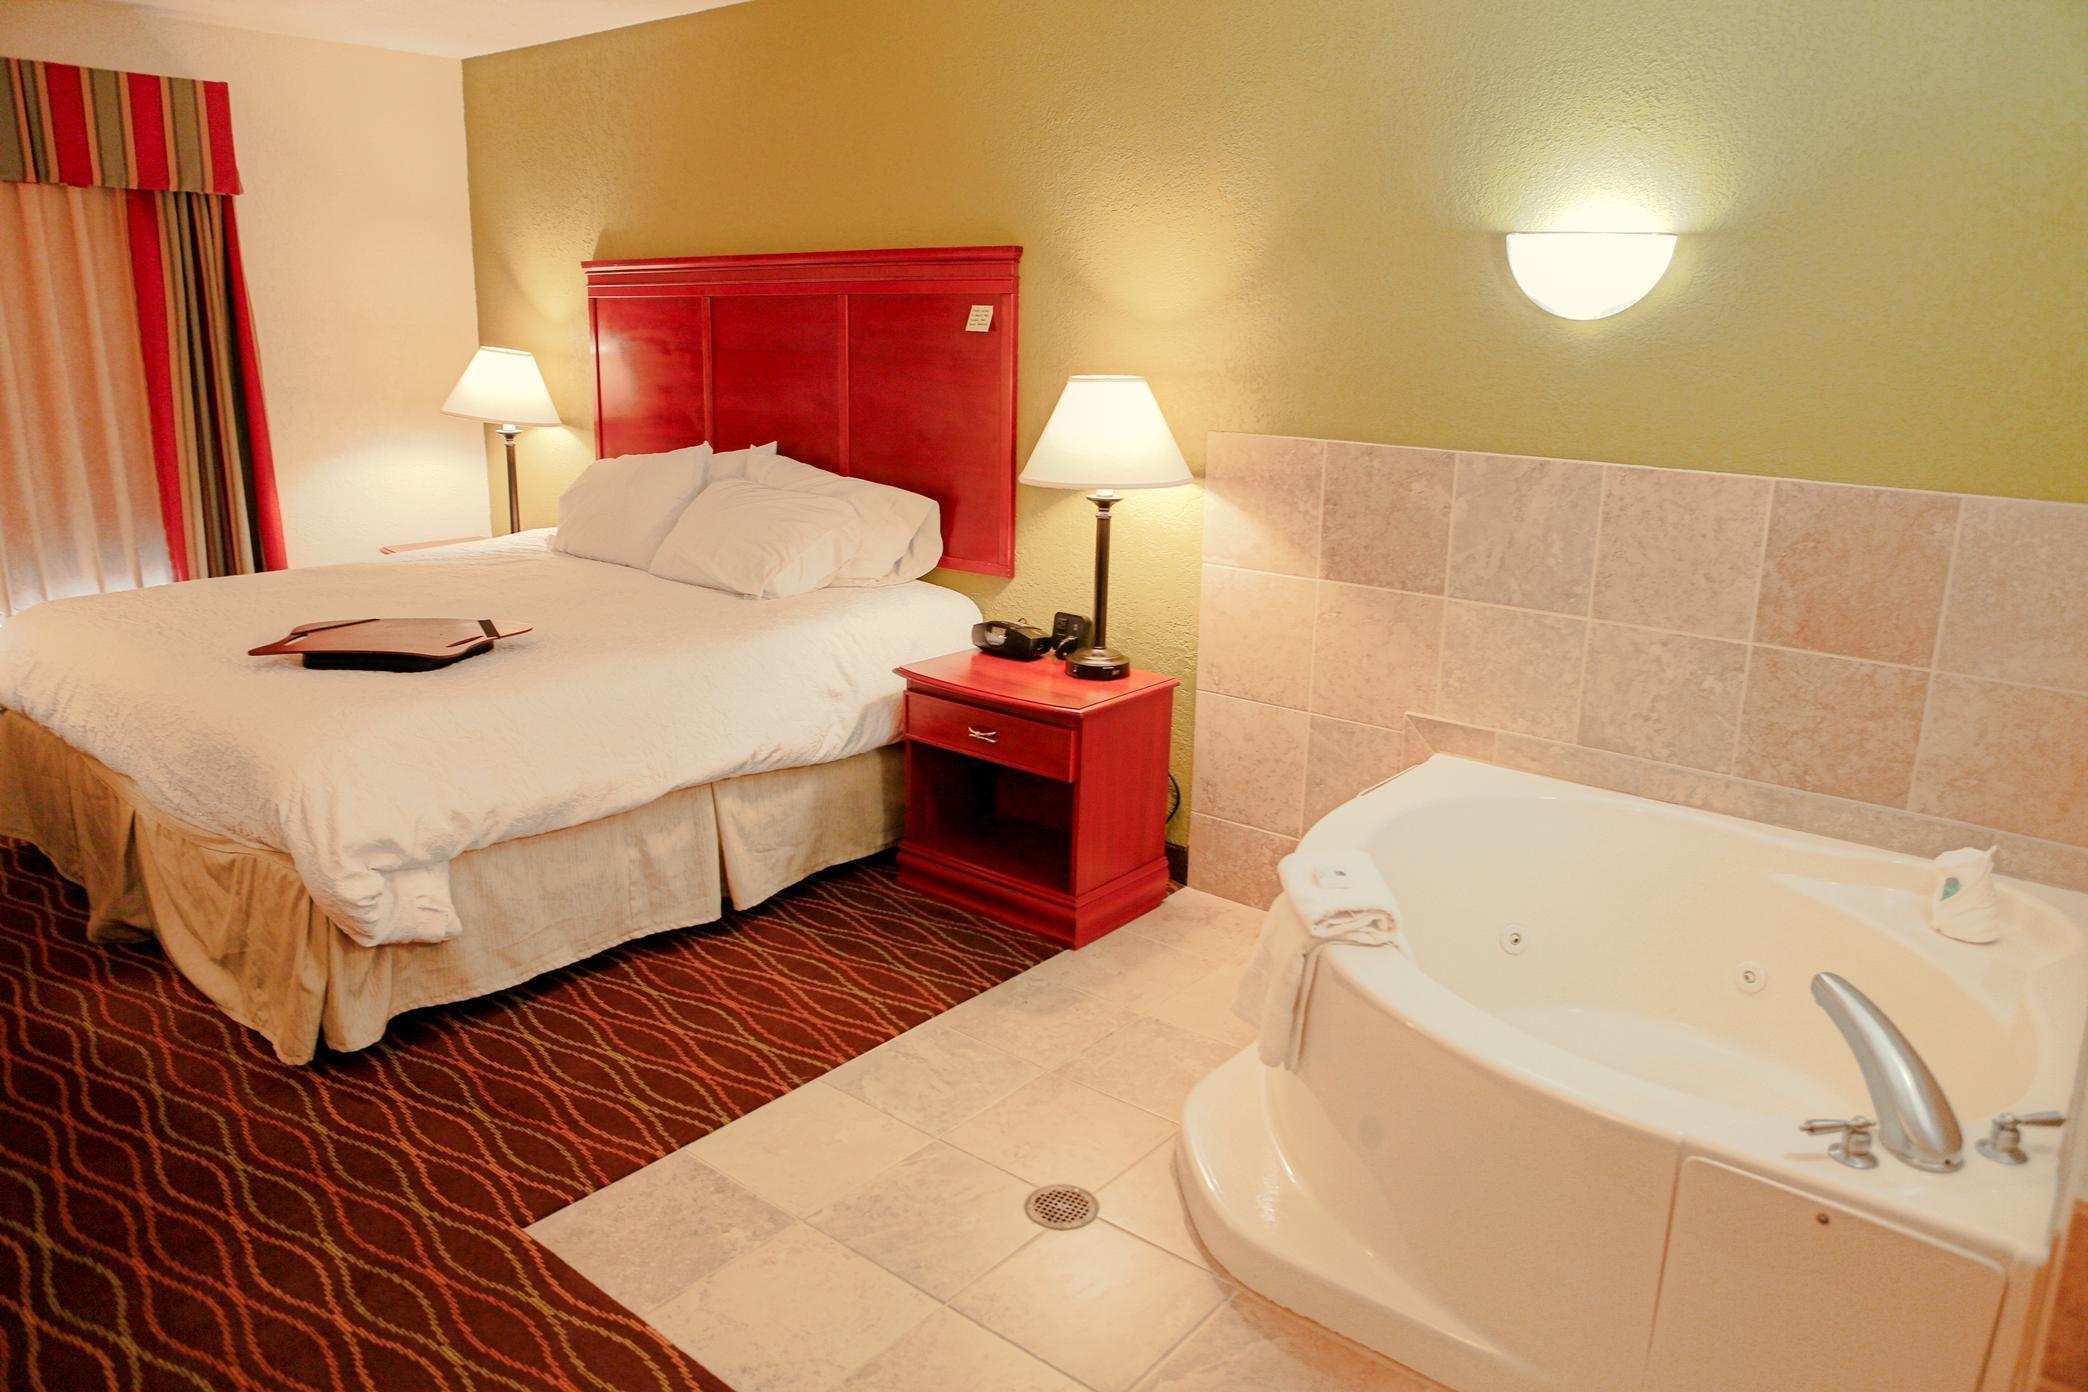 Hampton Inn & Suites Greenfield image 4